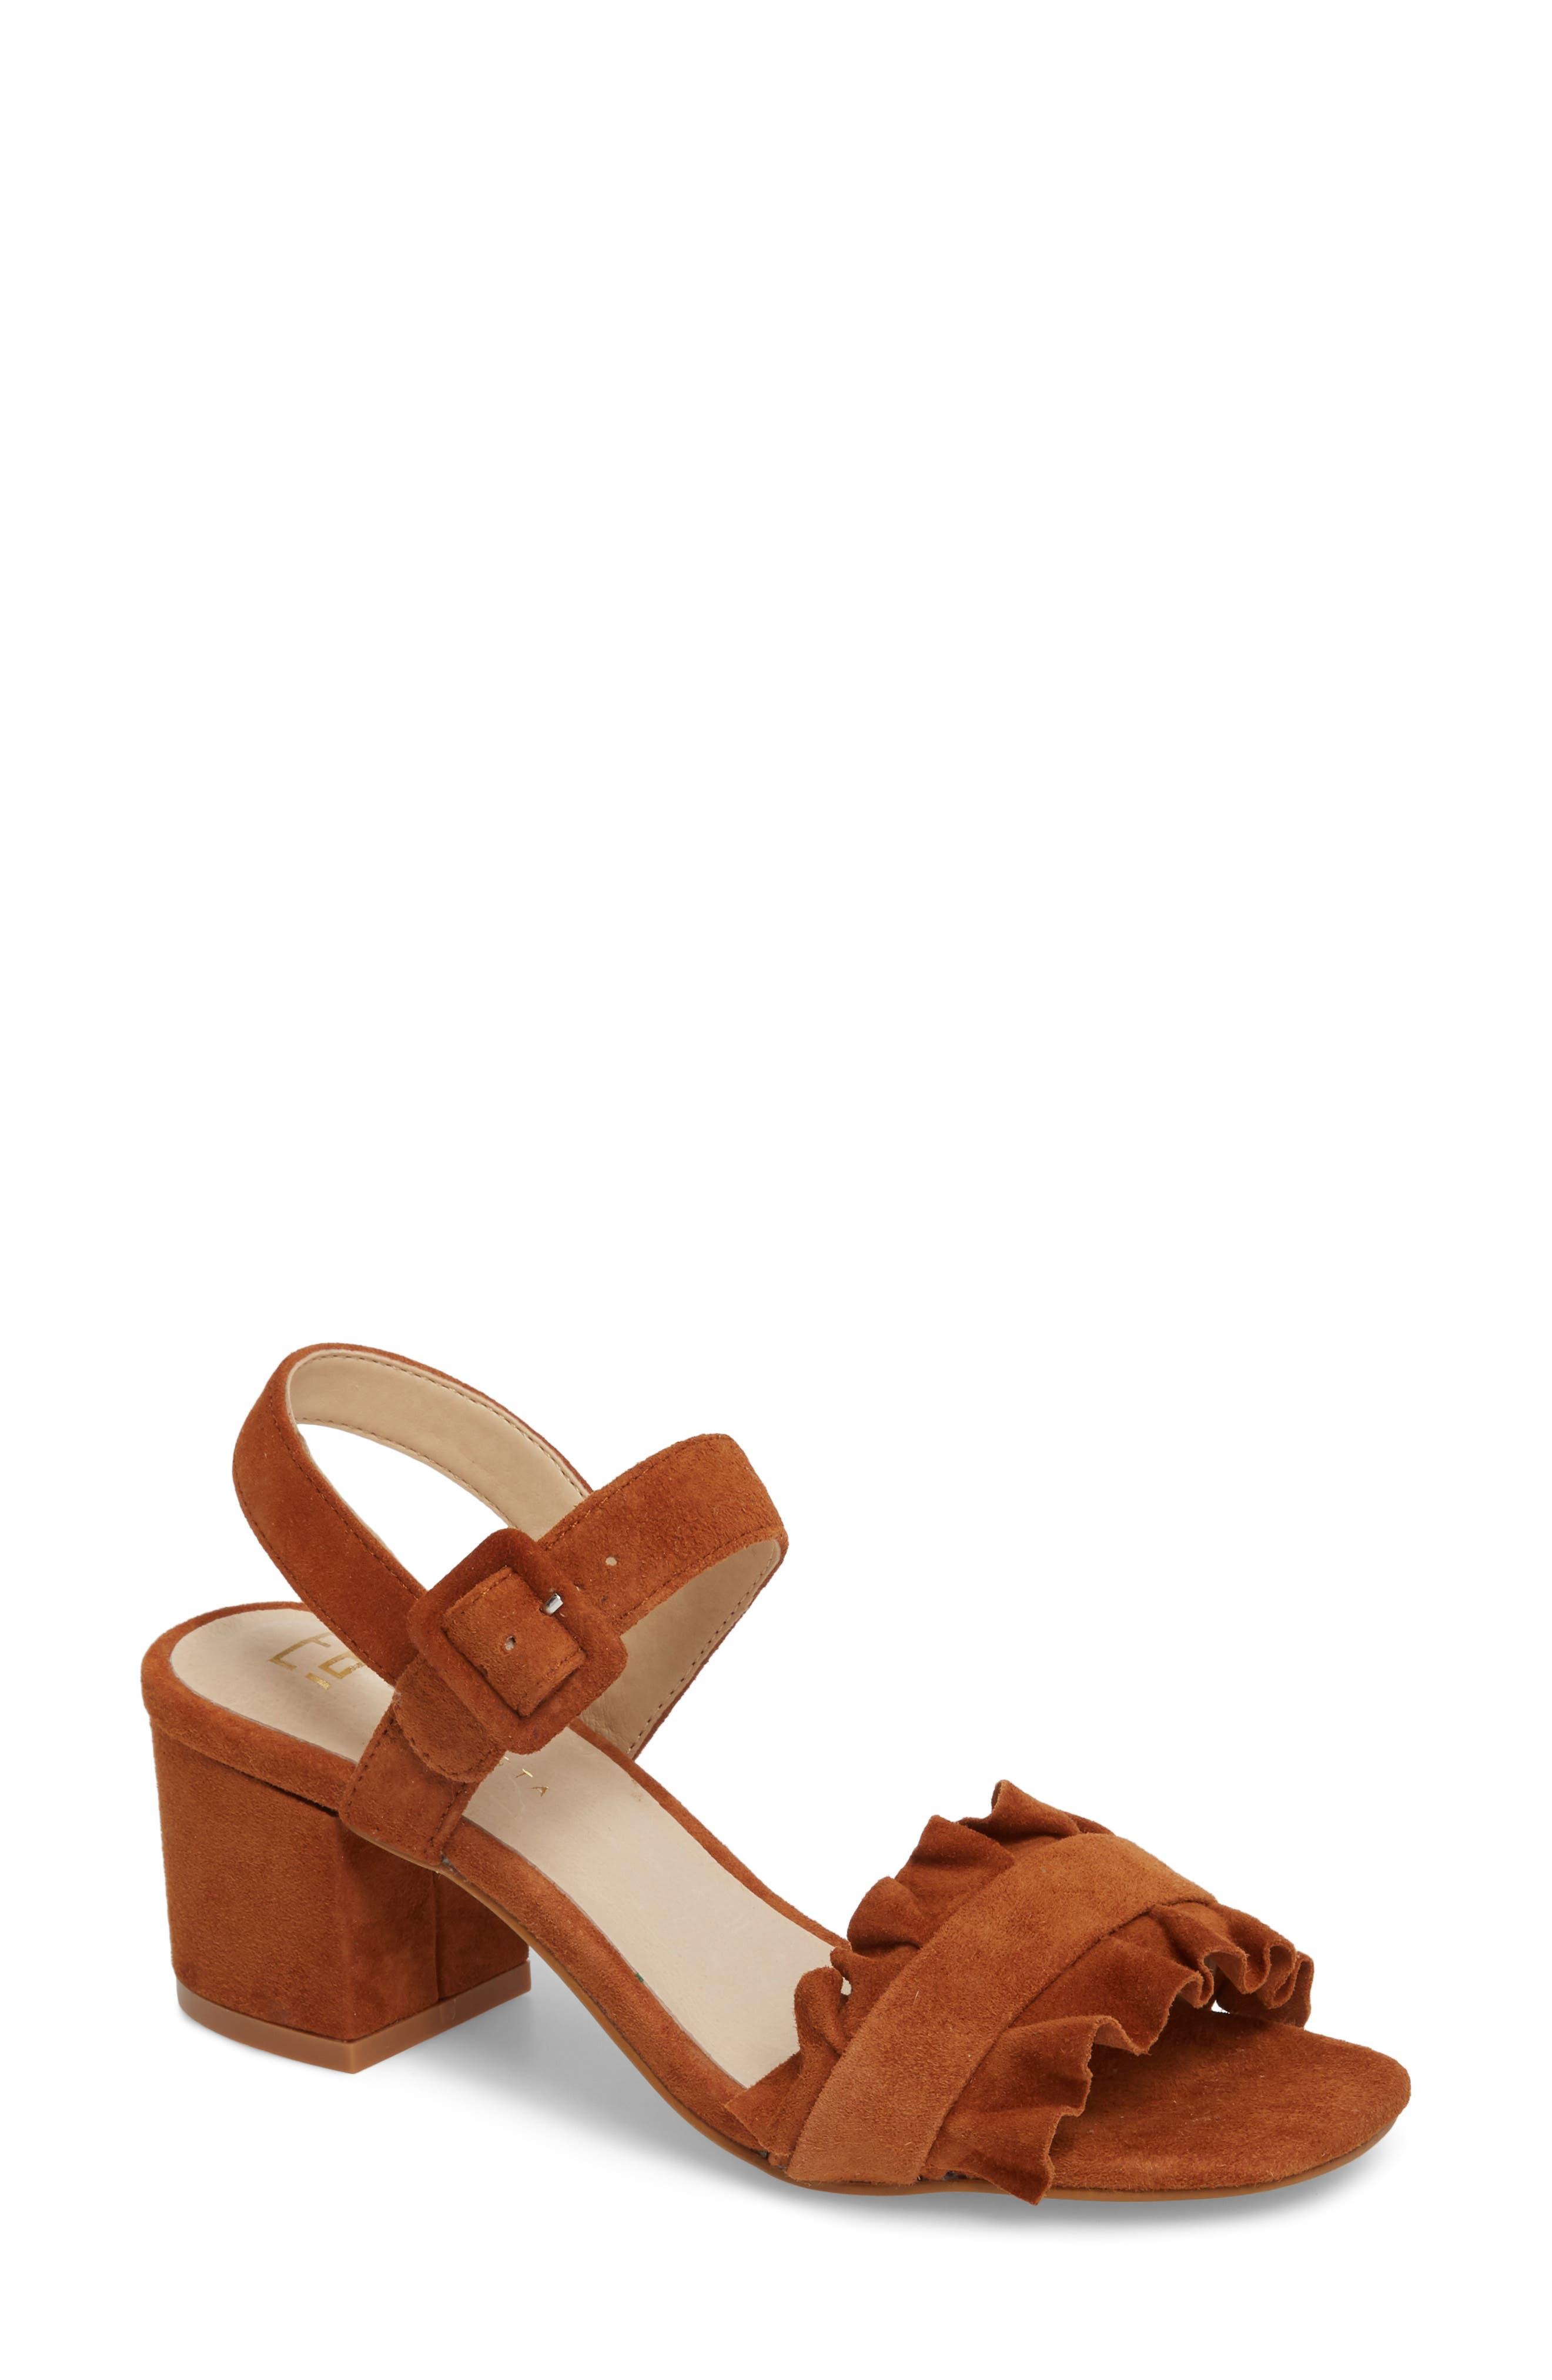 Sandie Block Heel Sandal,                             Main thumbnail 1, color,                             Tan Suede